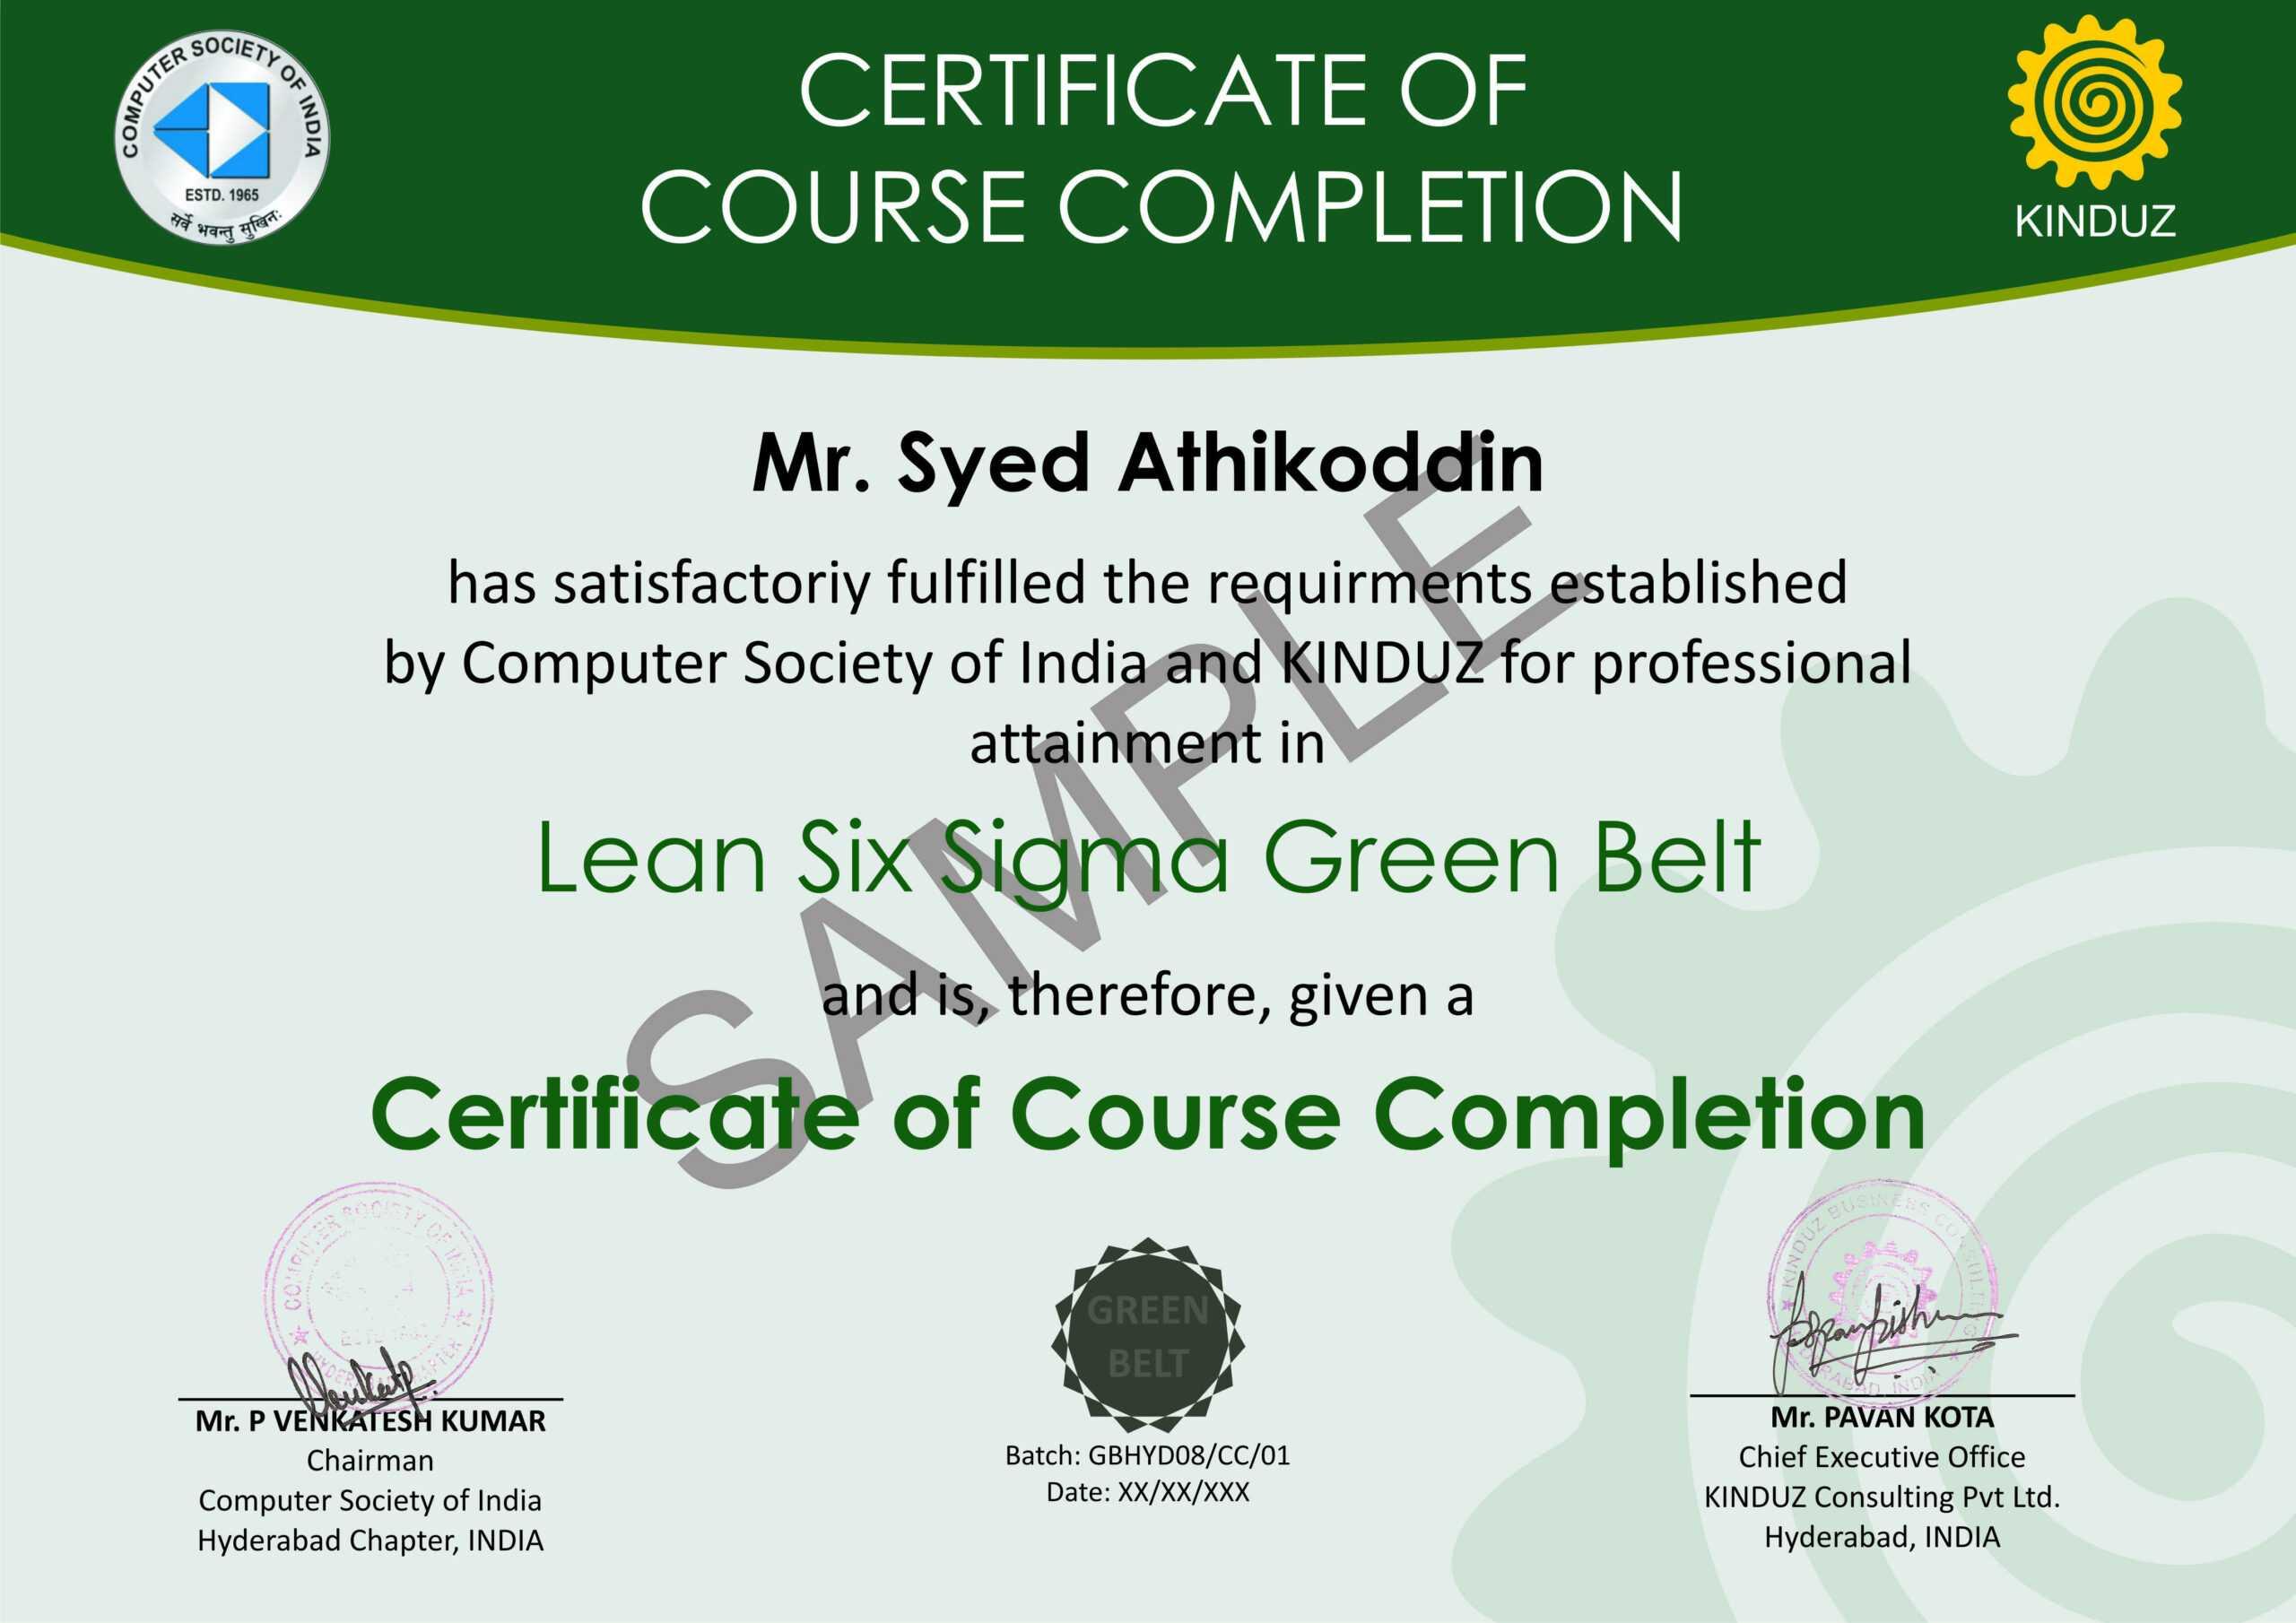 Sample Certificates - Lean Six Sigma India For Green Belt Certificate Template